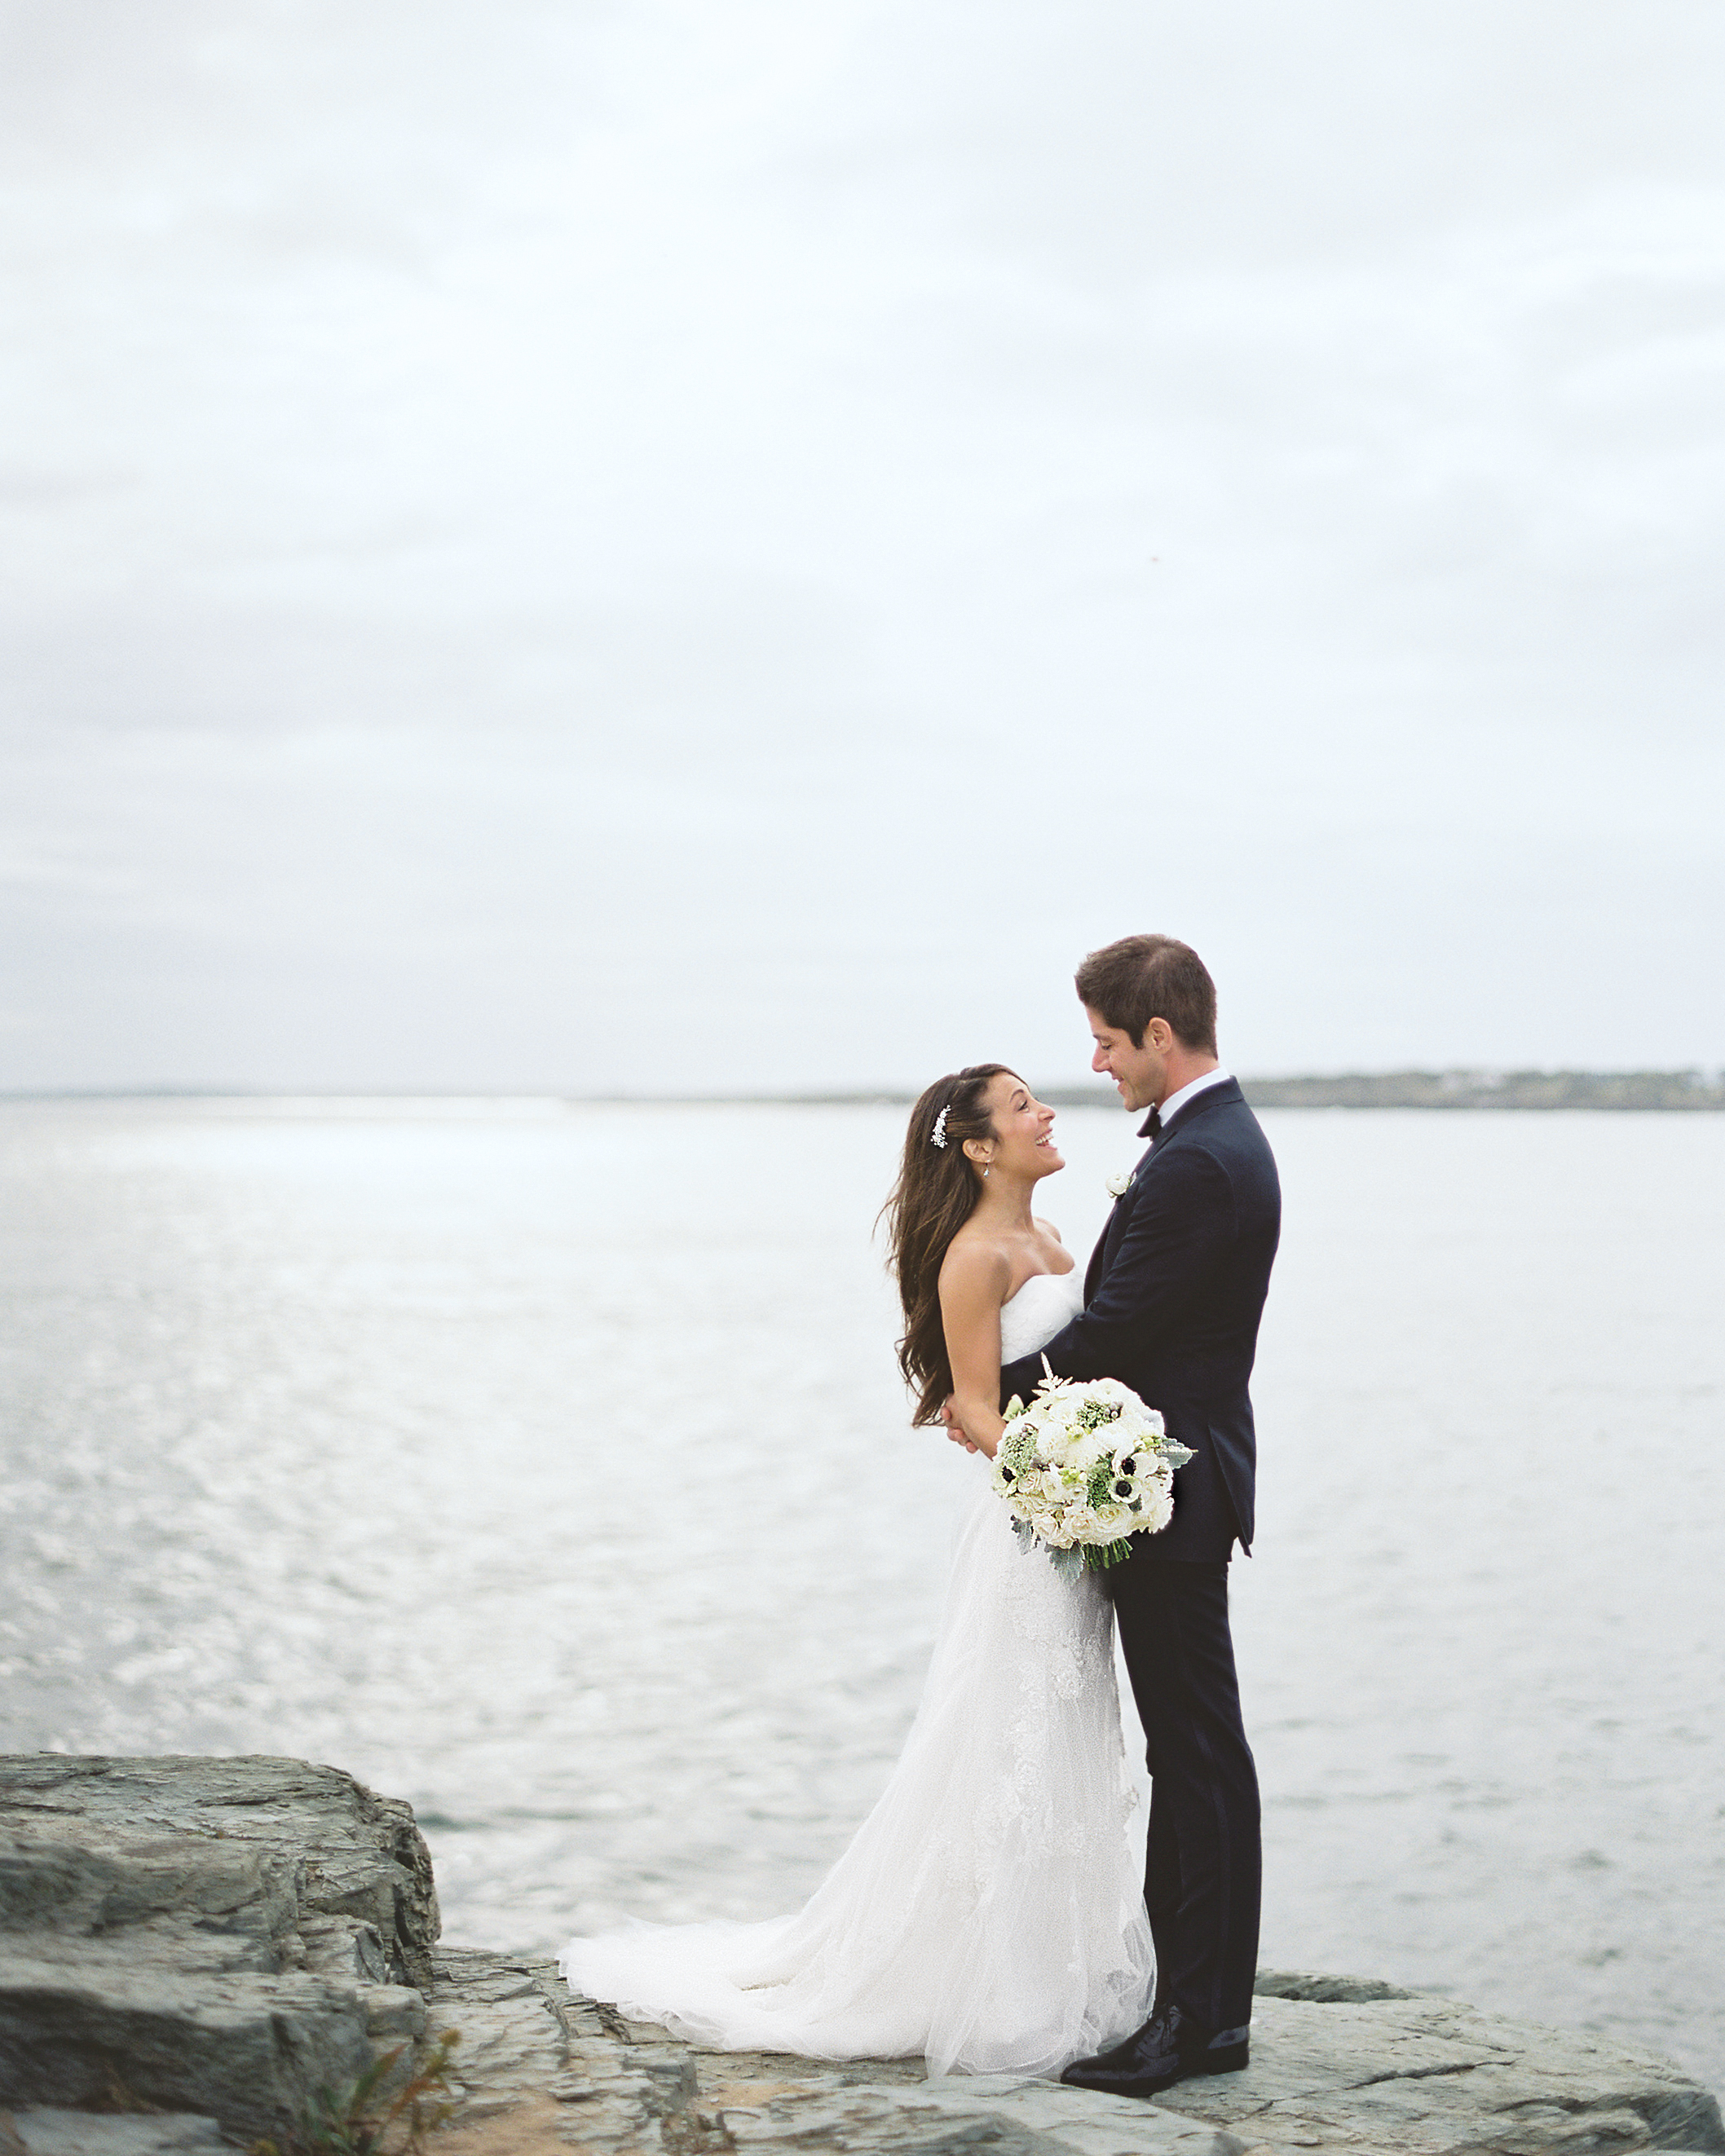 bride-groom-dsc-100-mwds110870.jpg